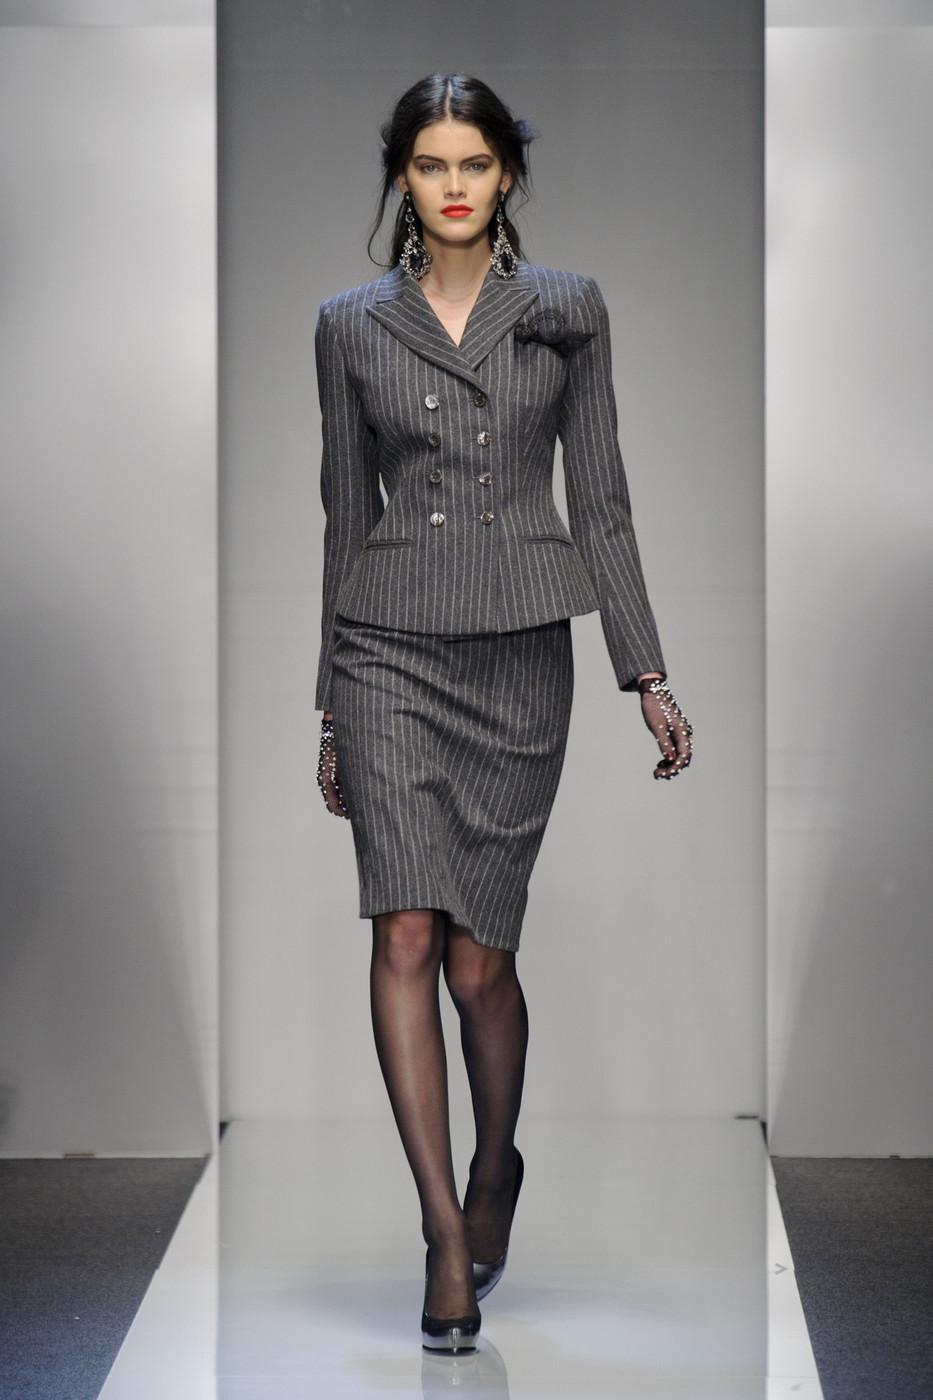 Classic fashion for women Mature